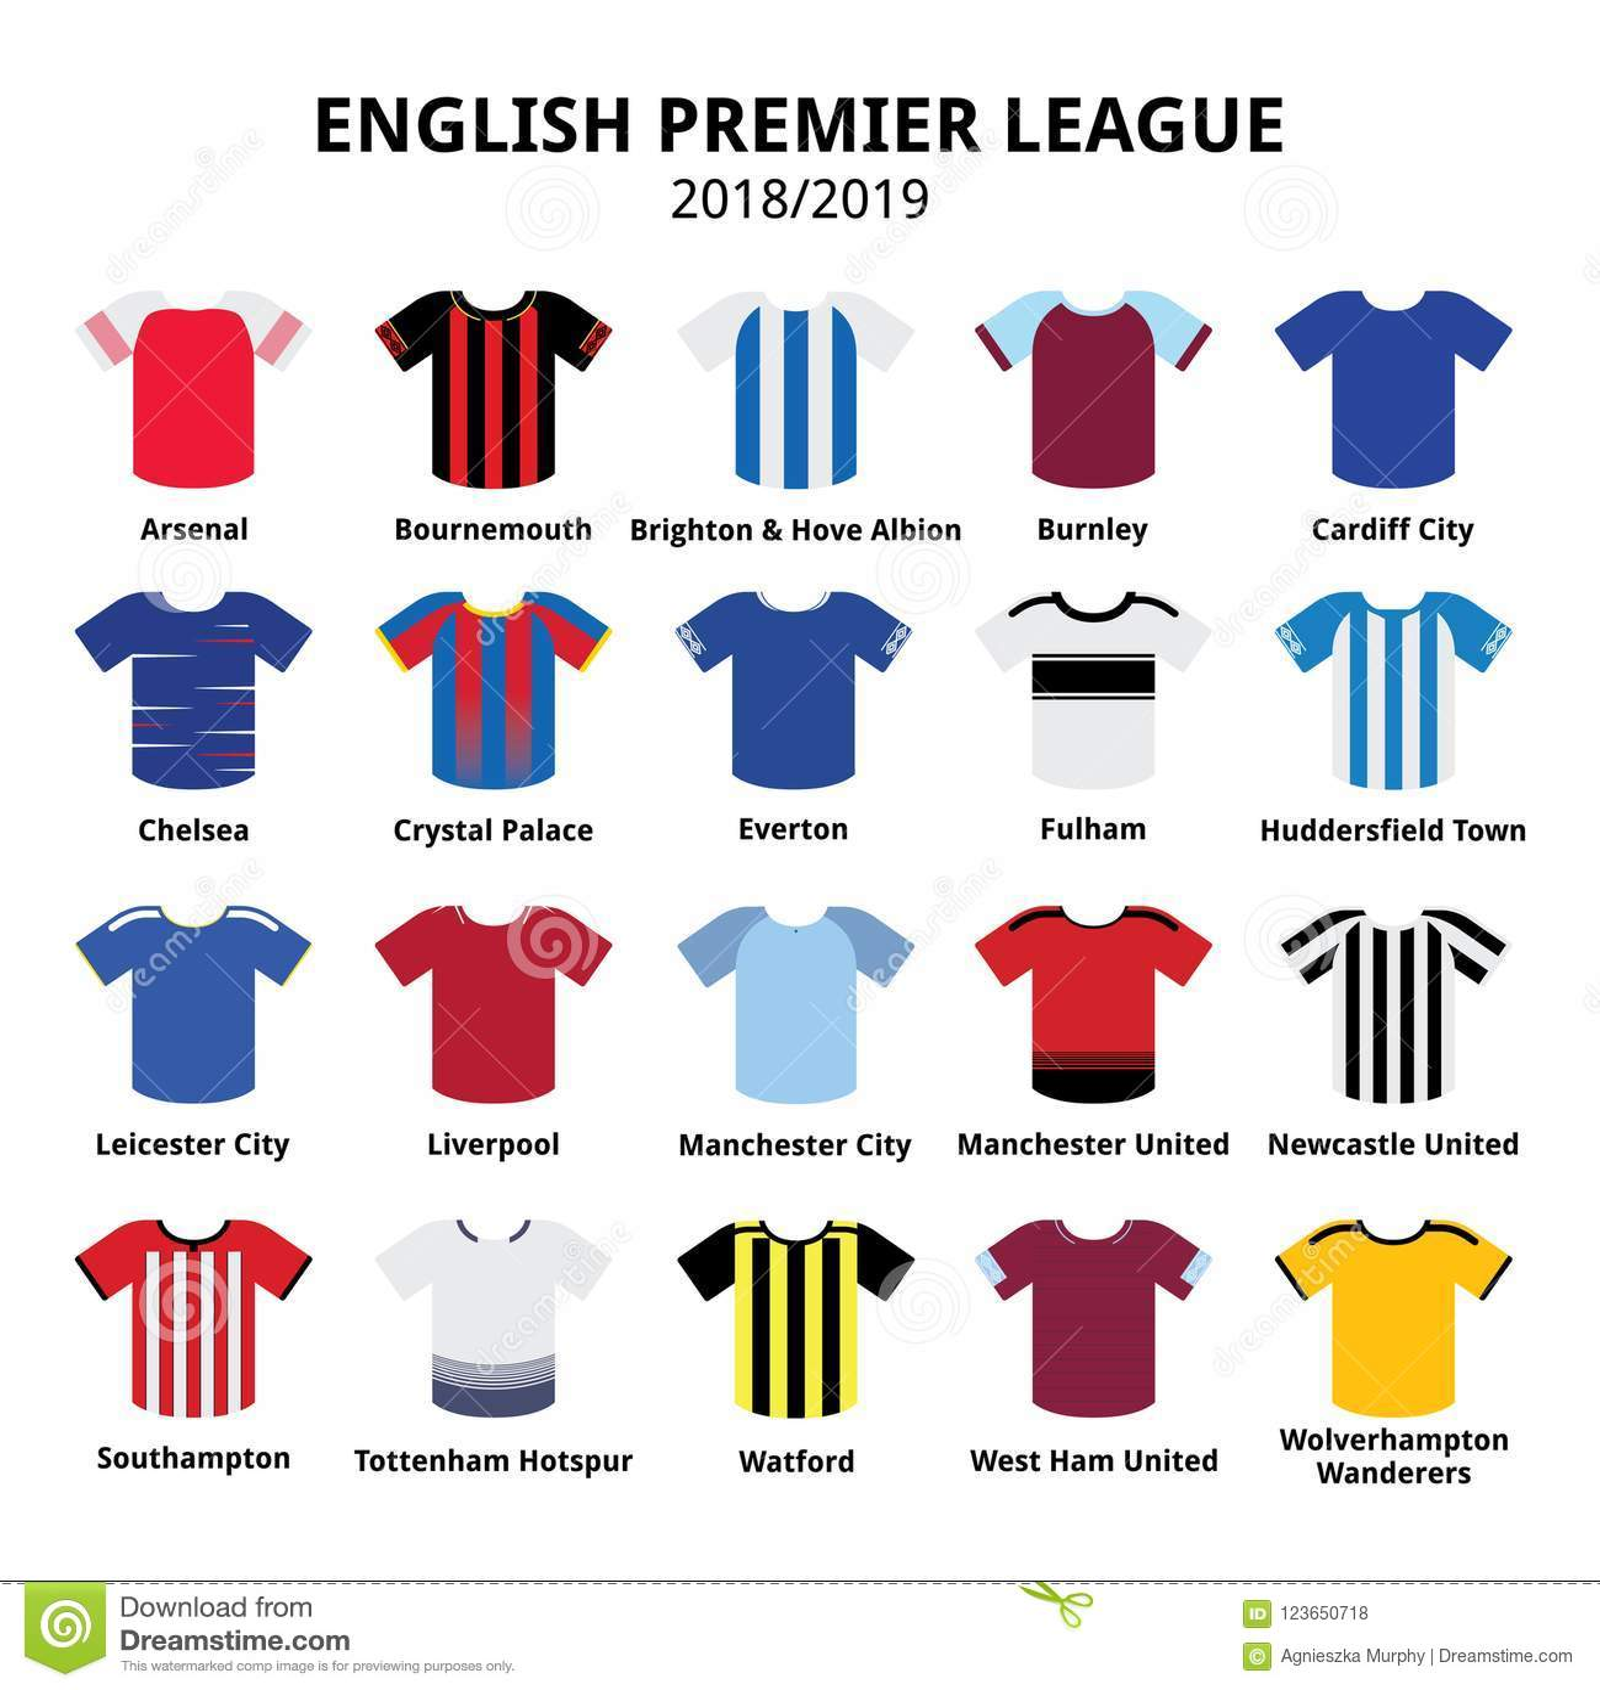 Английские лиги по футболу